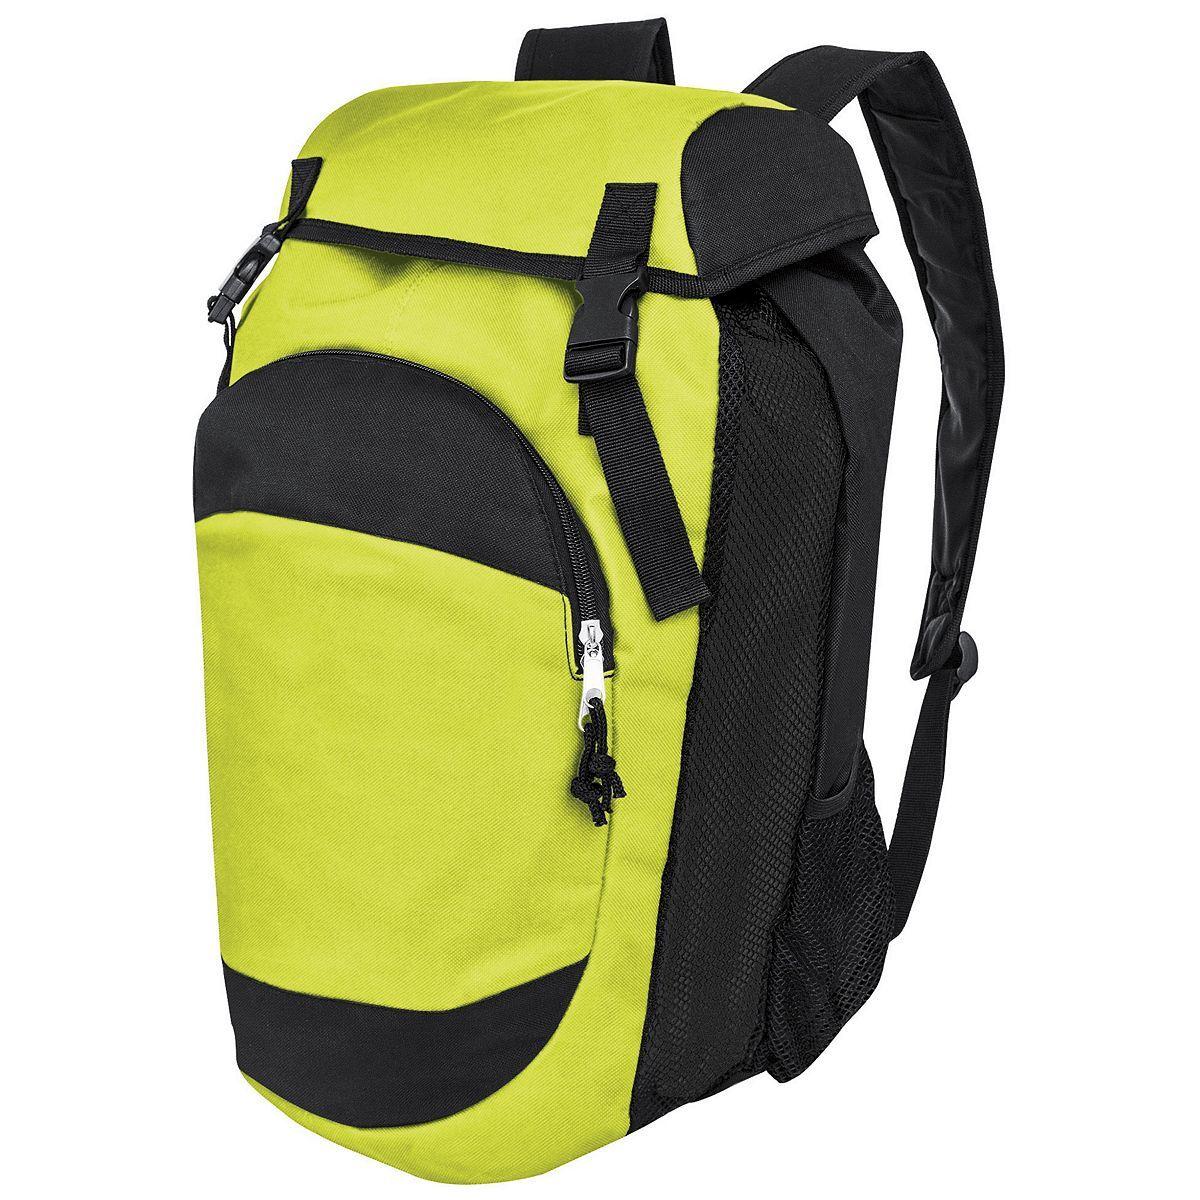 Gear Bag - LIME/BLACK